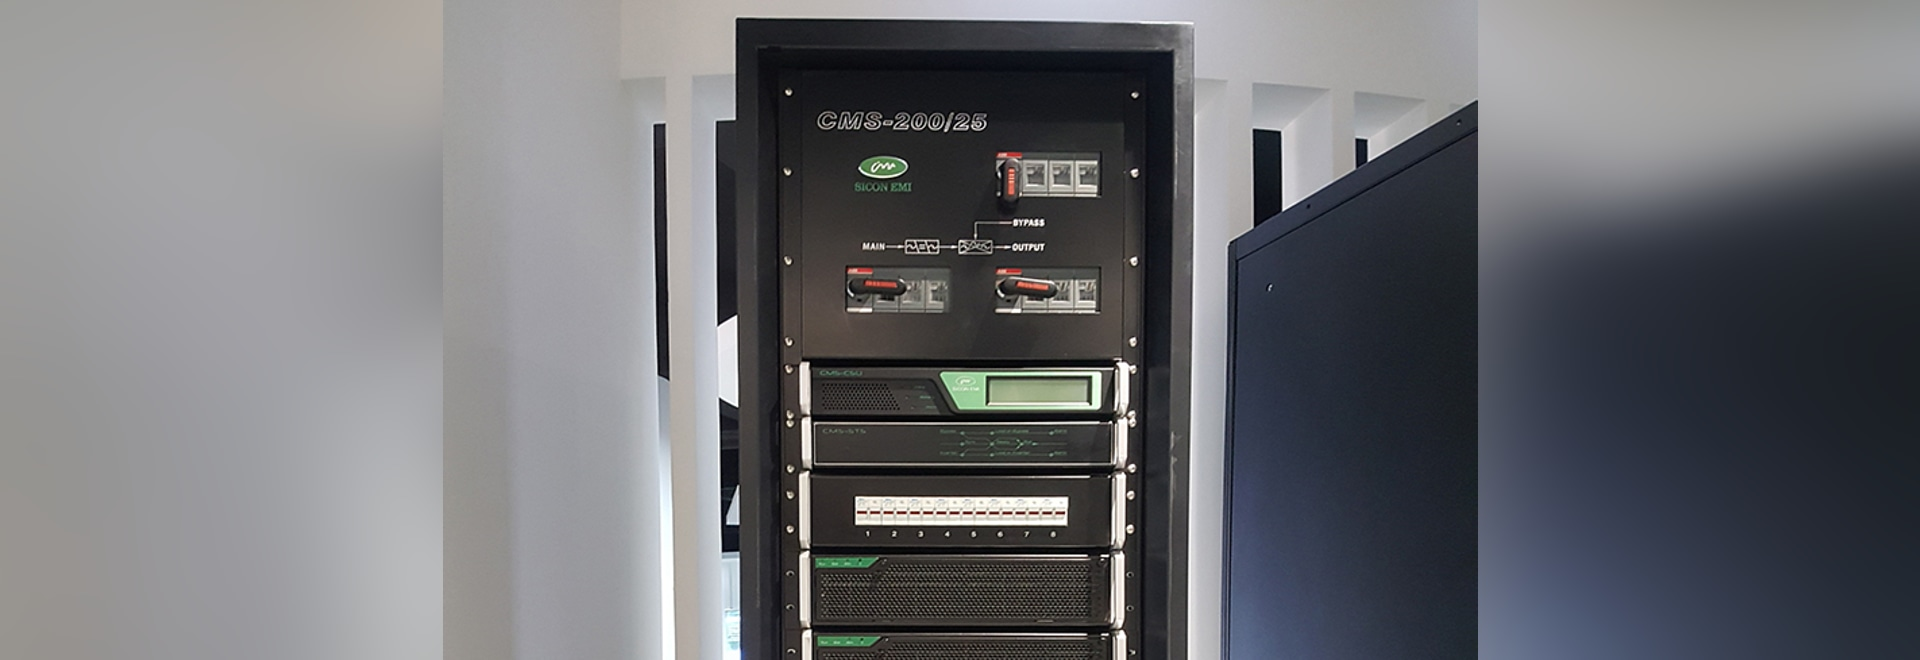 Sicon modulares UPS installiert in Peking-Gas-Gruppe